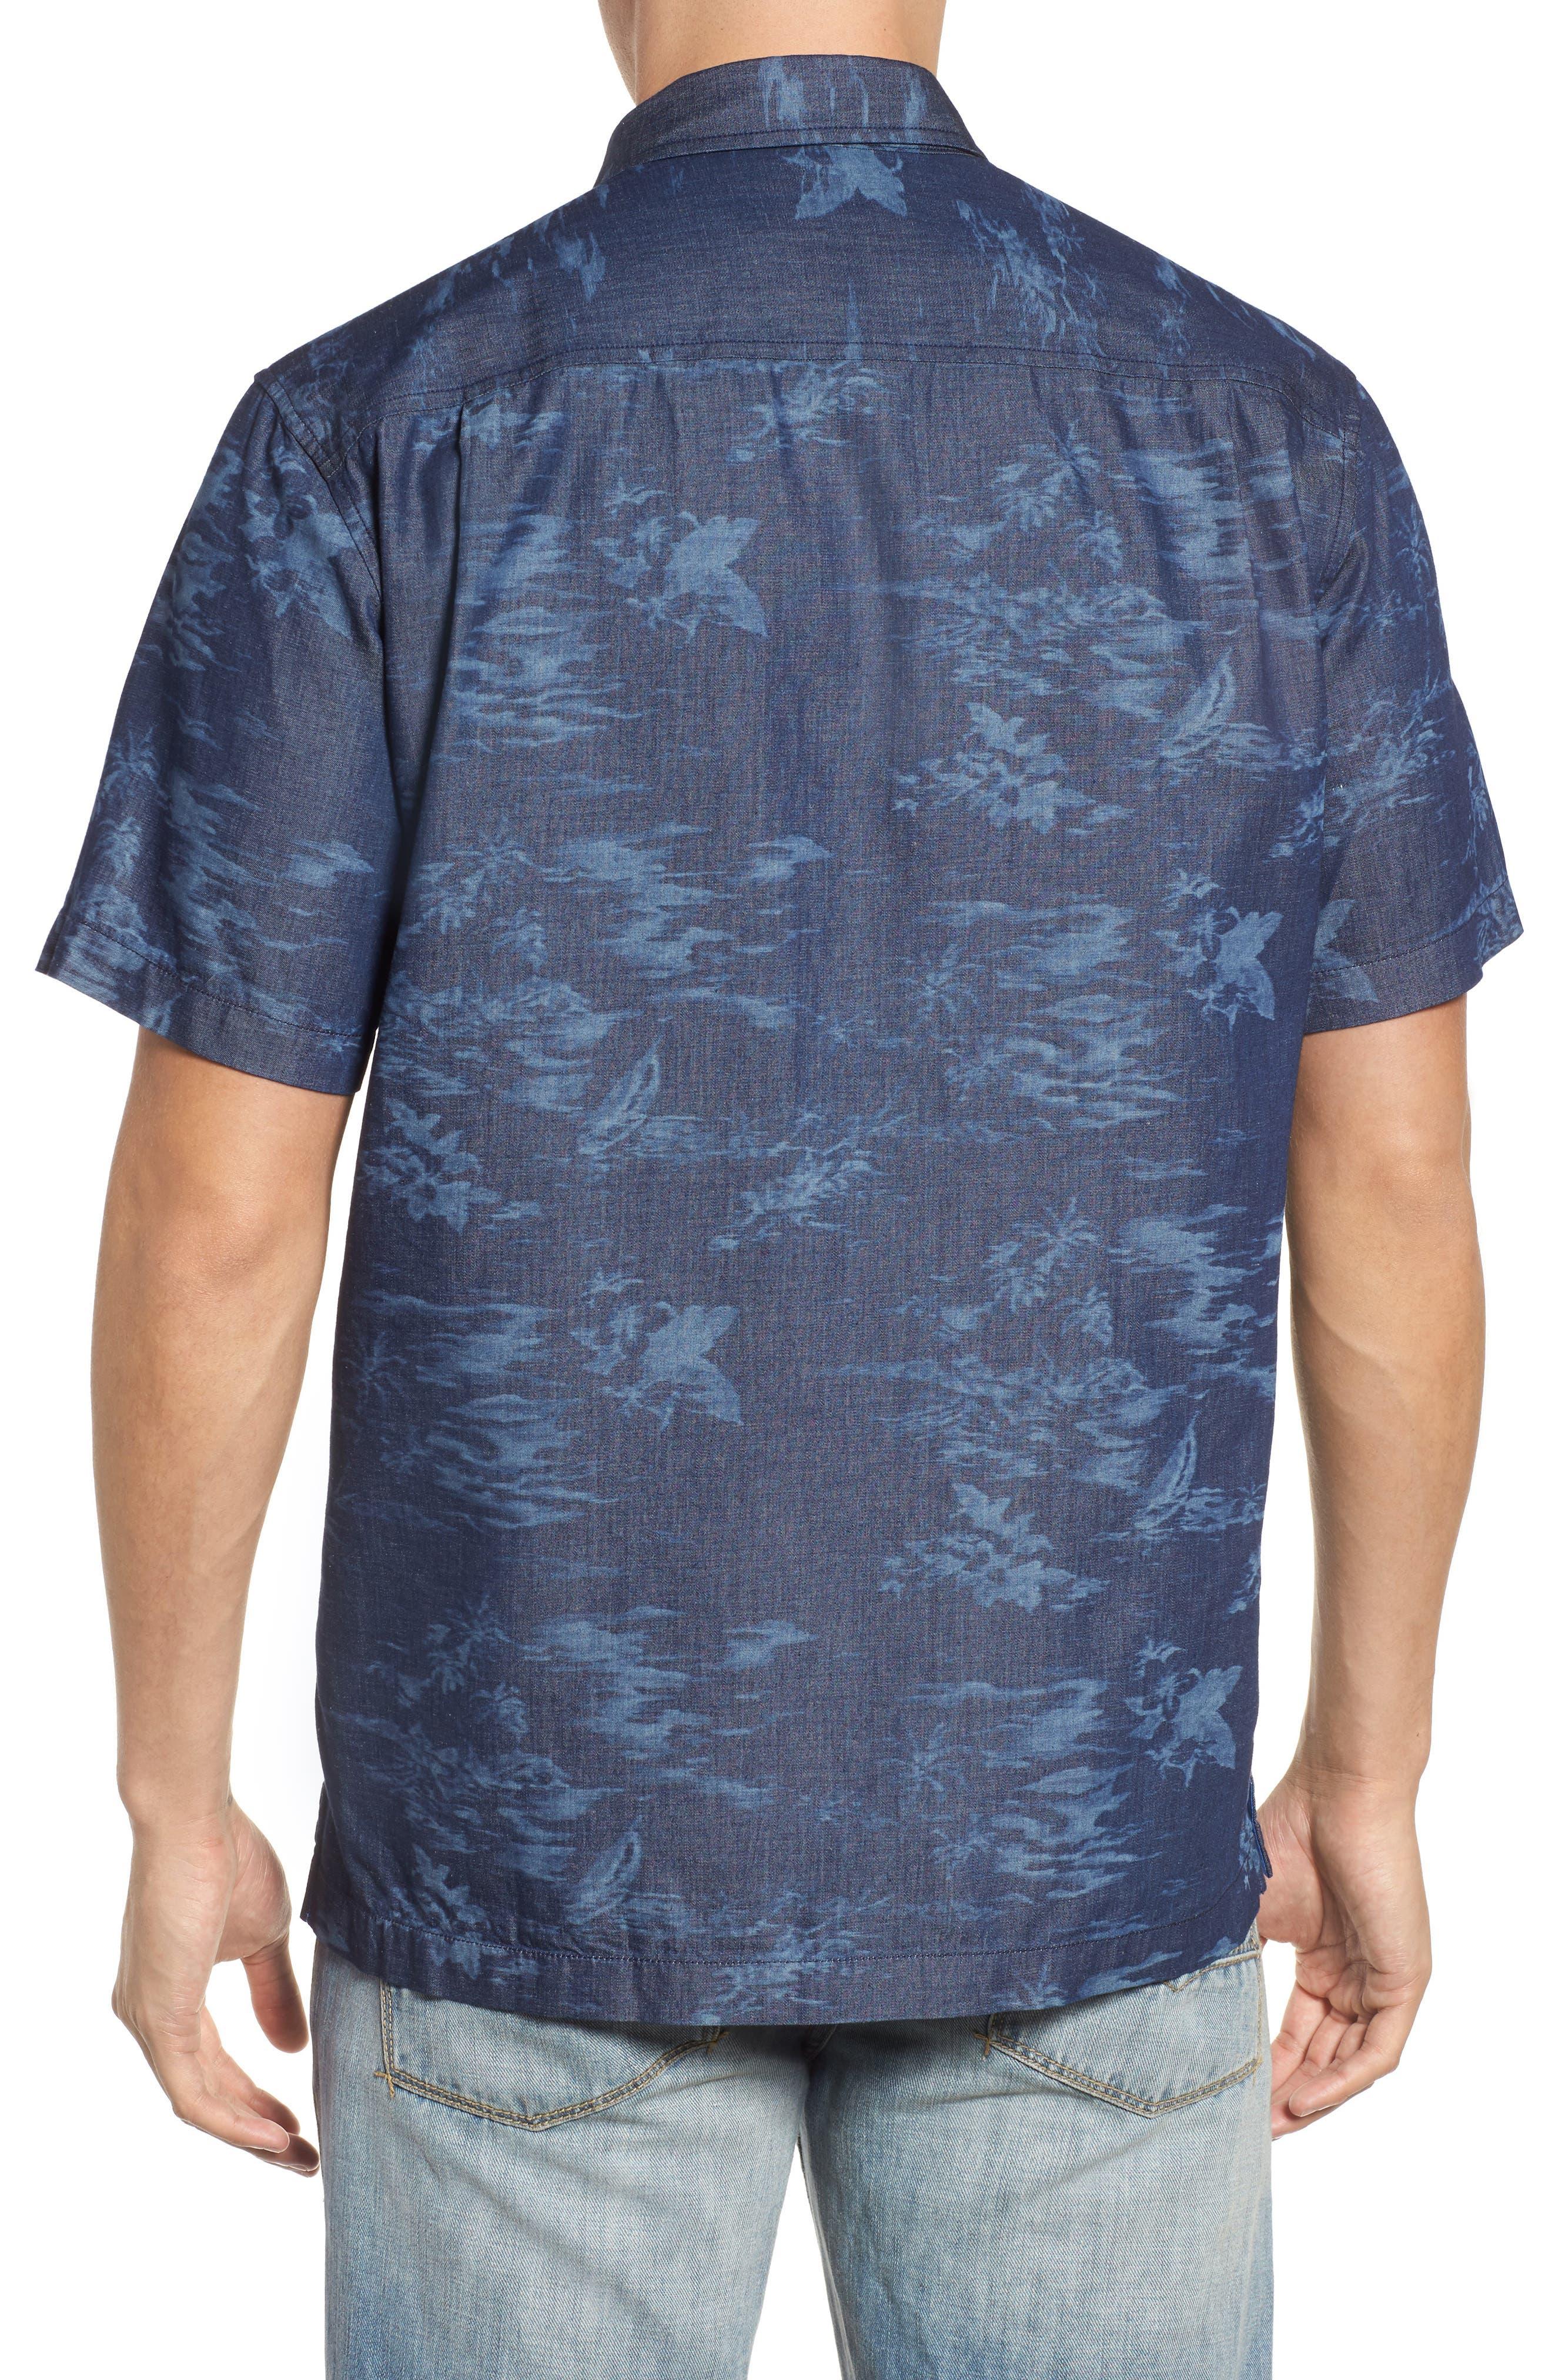 South Beach Scenic Cotton & Silk Camp Shirt,                             Alternate thumbnail 2, color,                             Indigo